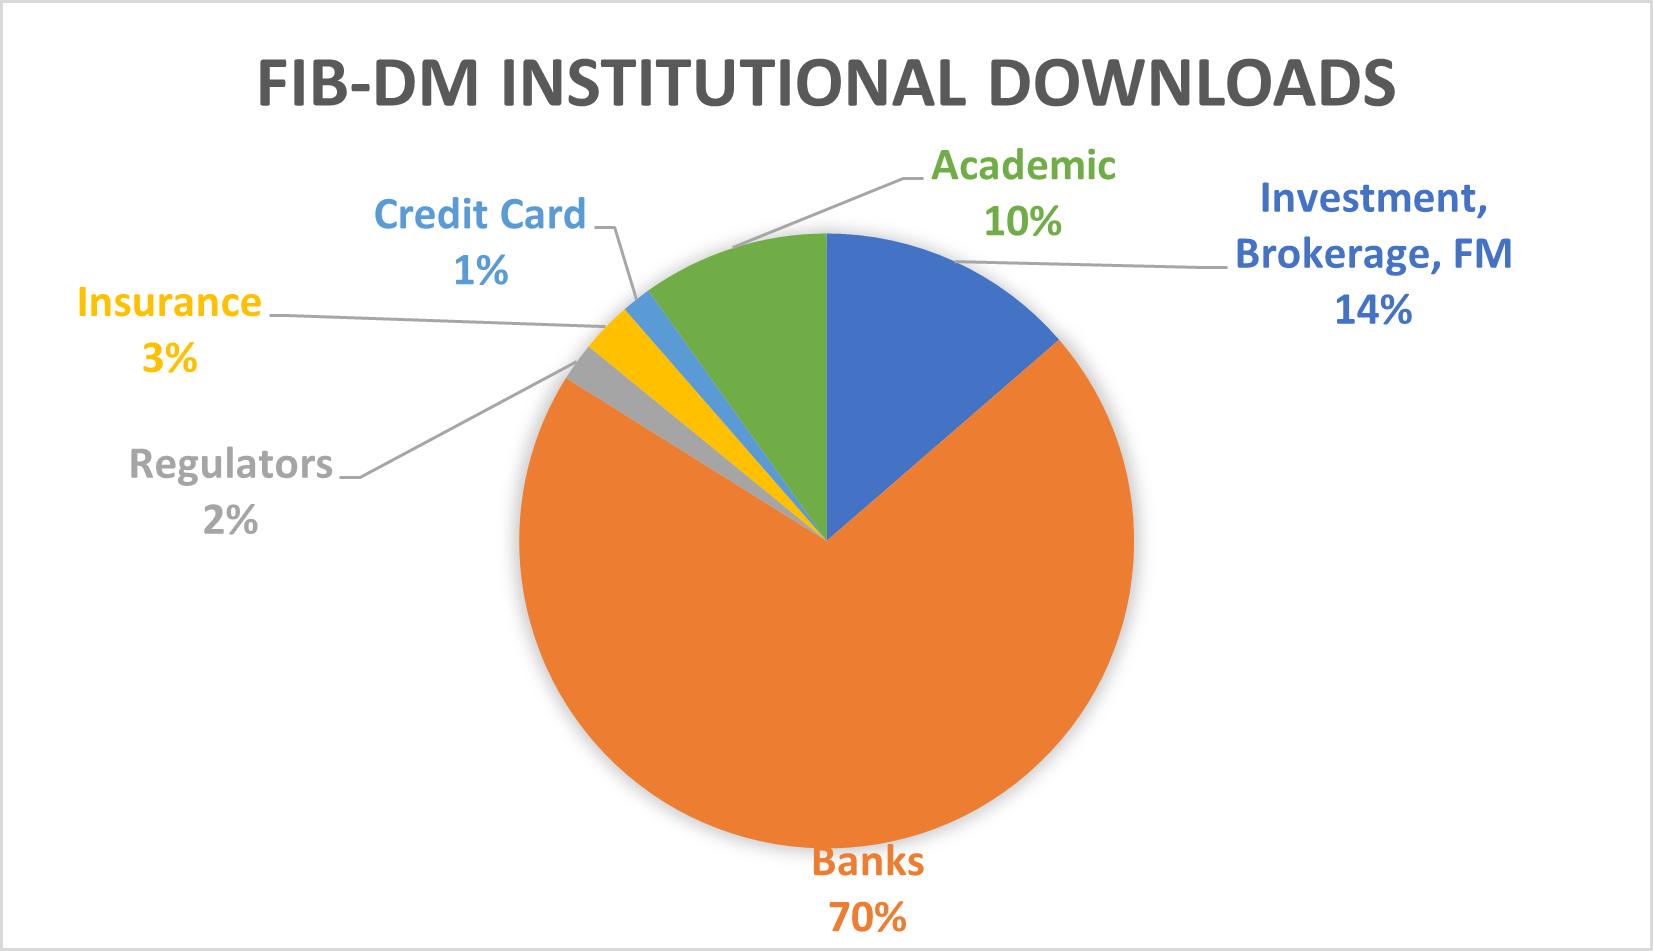 FIB-DM Institutional downloads (pie chart)